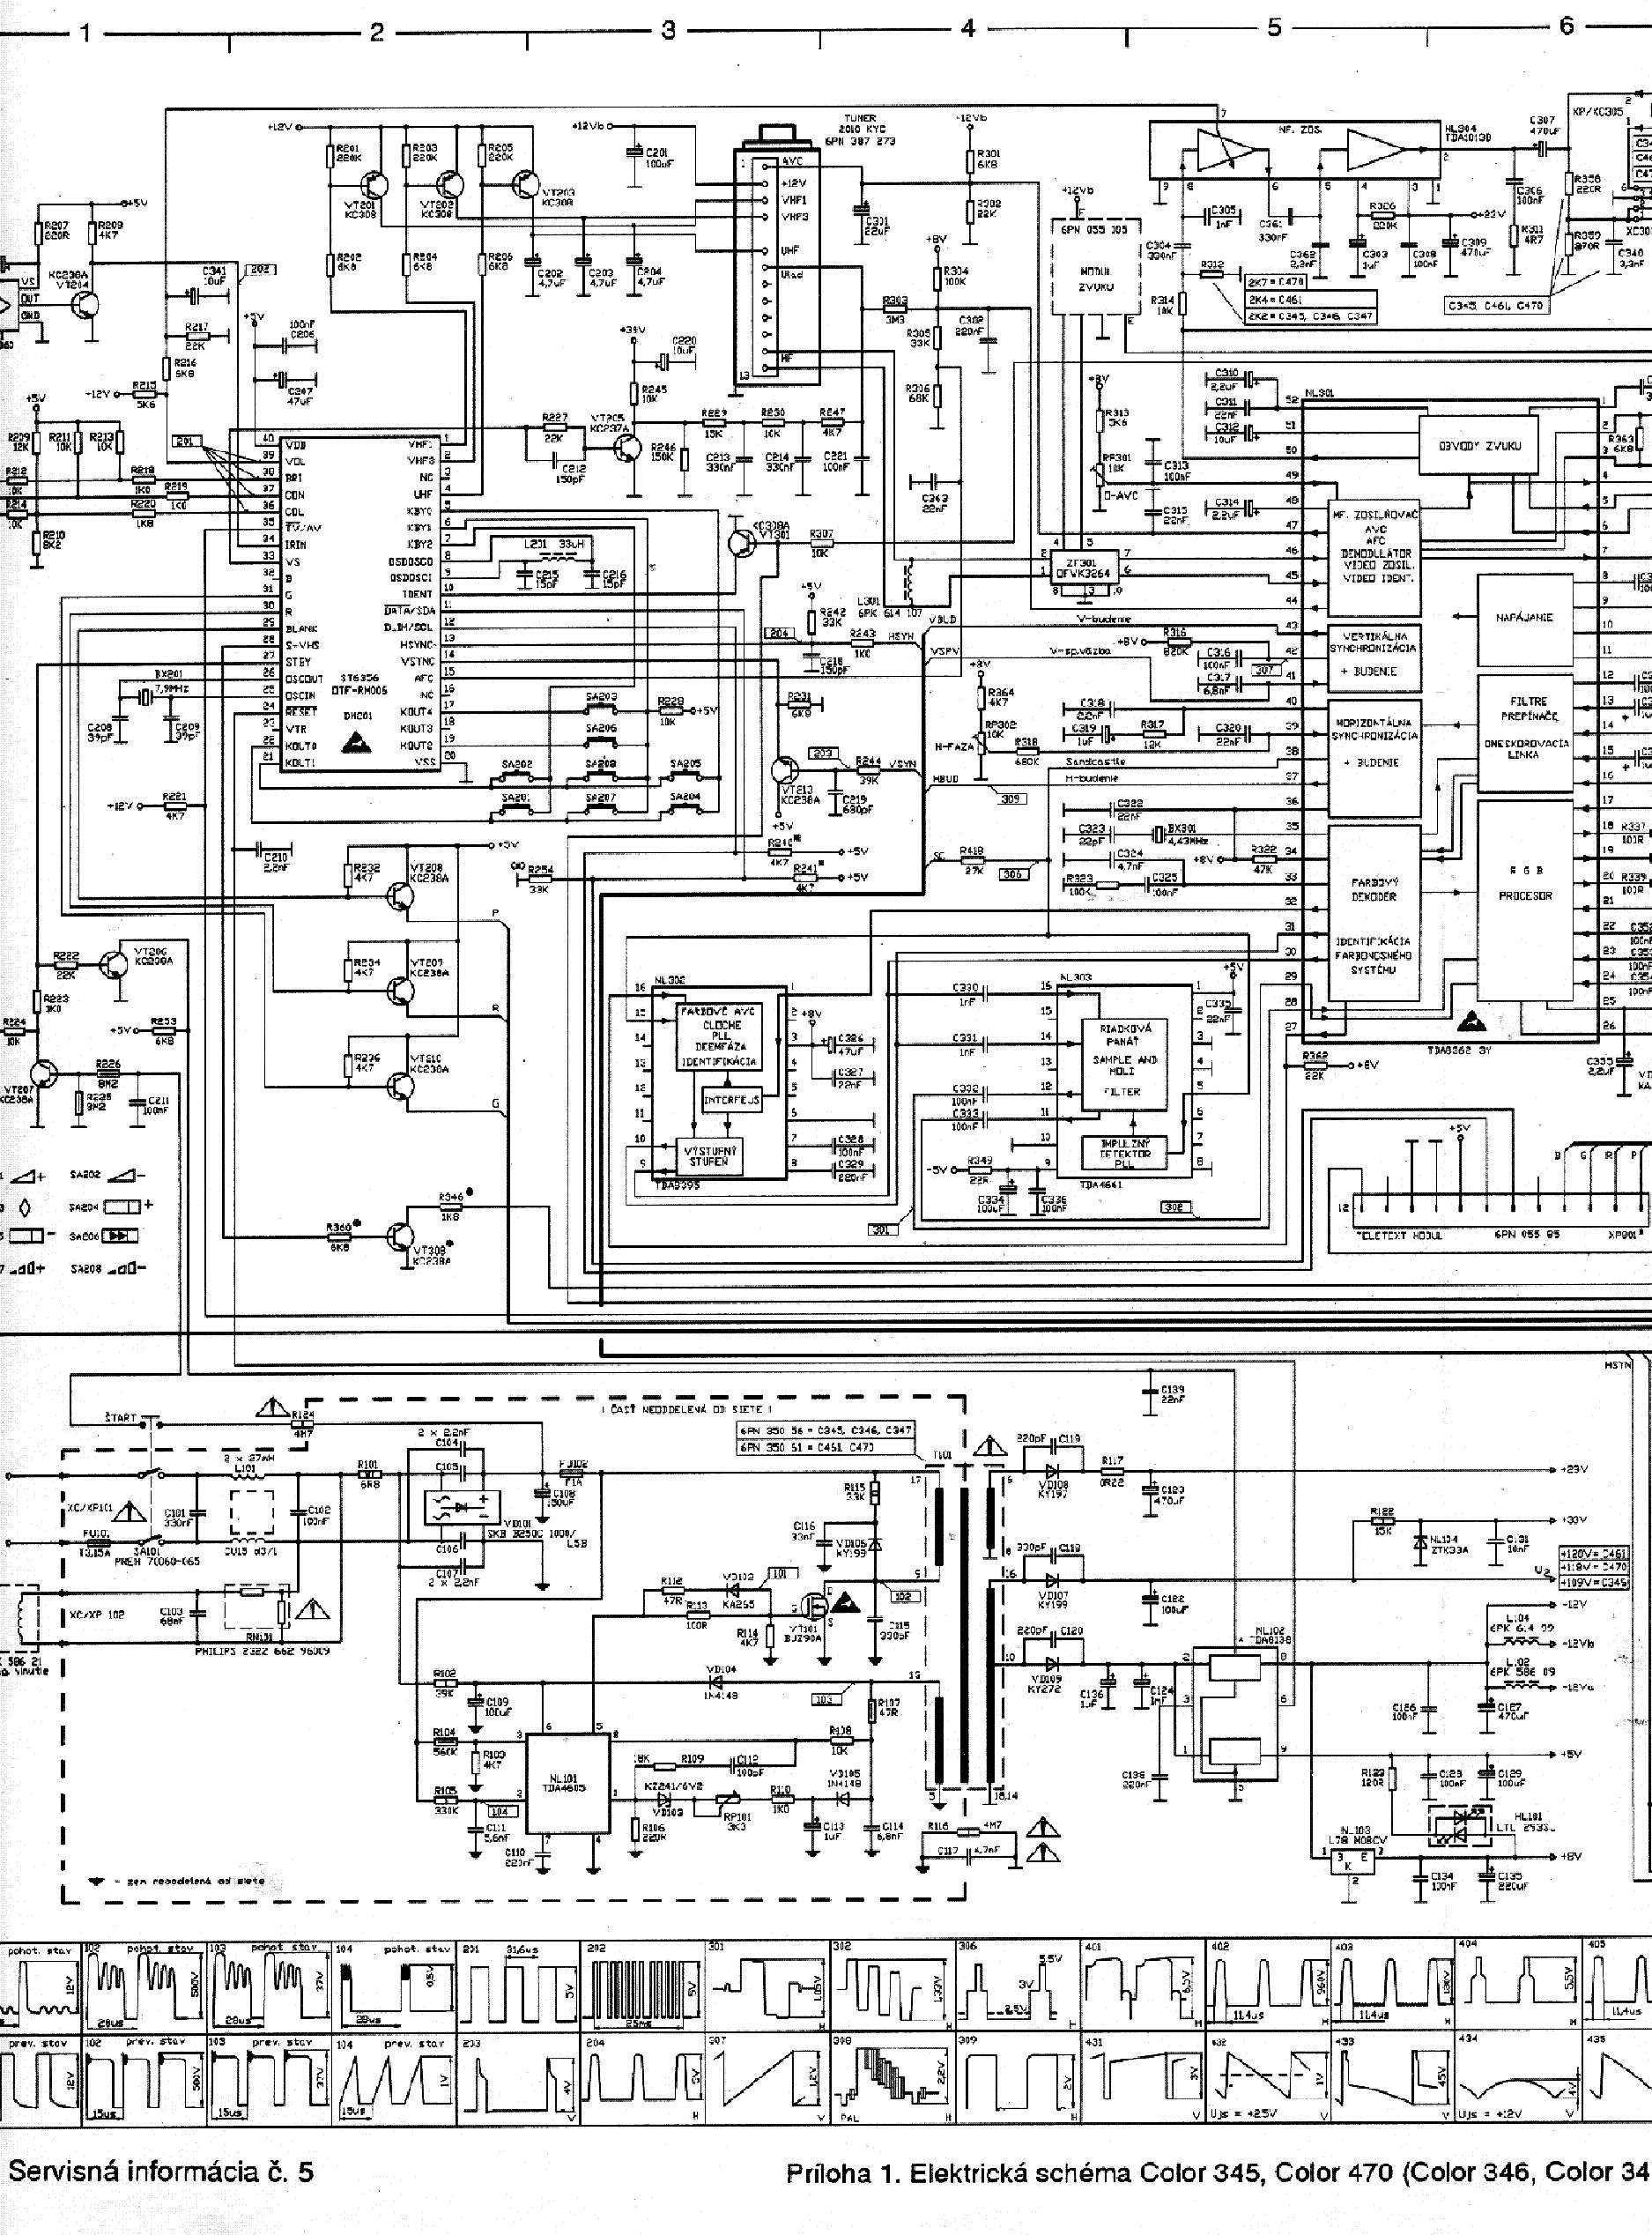 Tv Color345 Schema Service Manual Download  Schematics